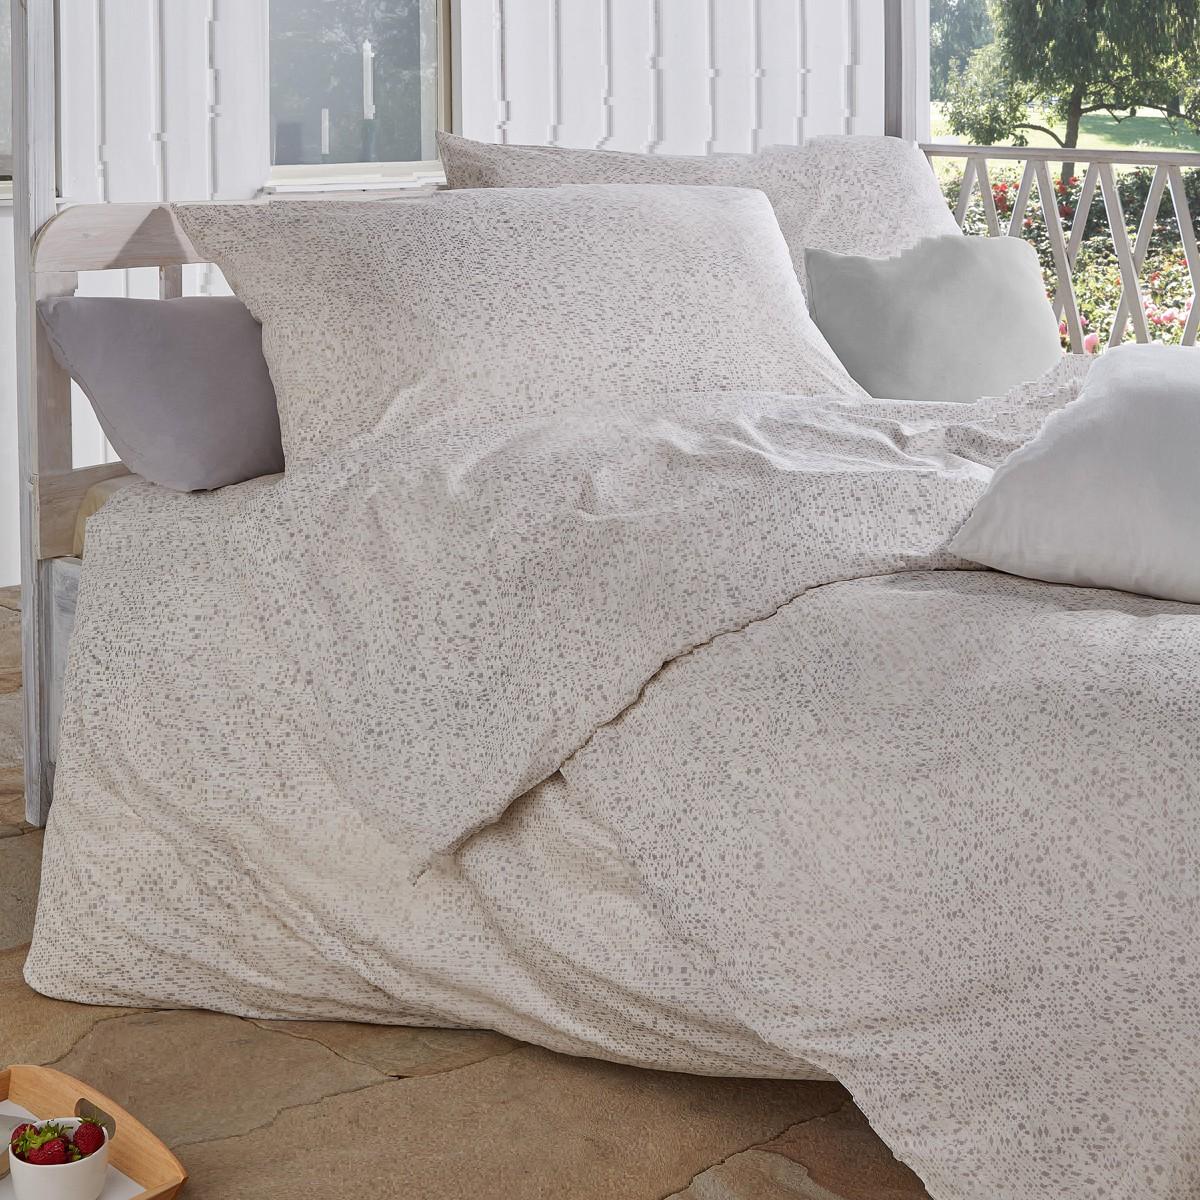 mako batist bettw sche estella tarifa natur 155x220 cm bettw sche batist bettw sche. Black Bedroom Furniture Sets. Home Design Ideas